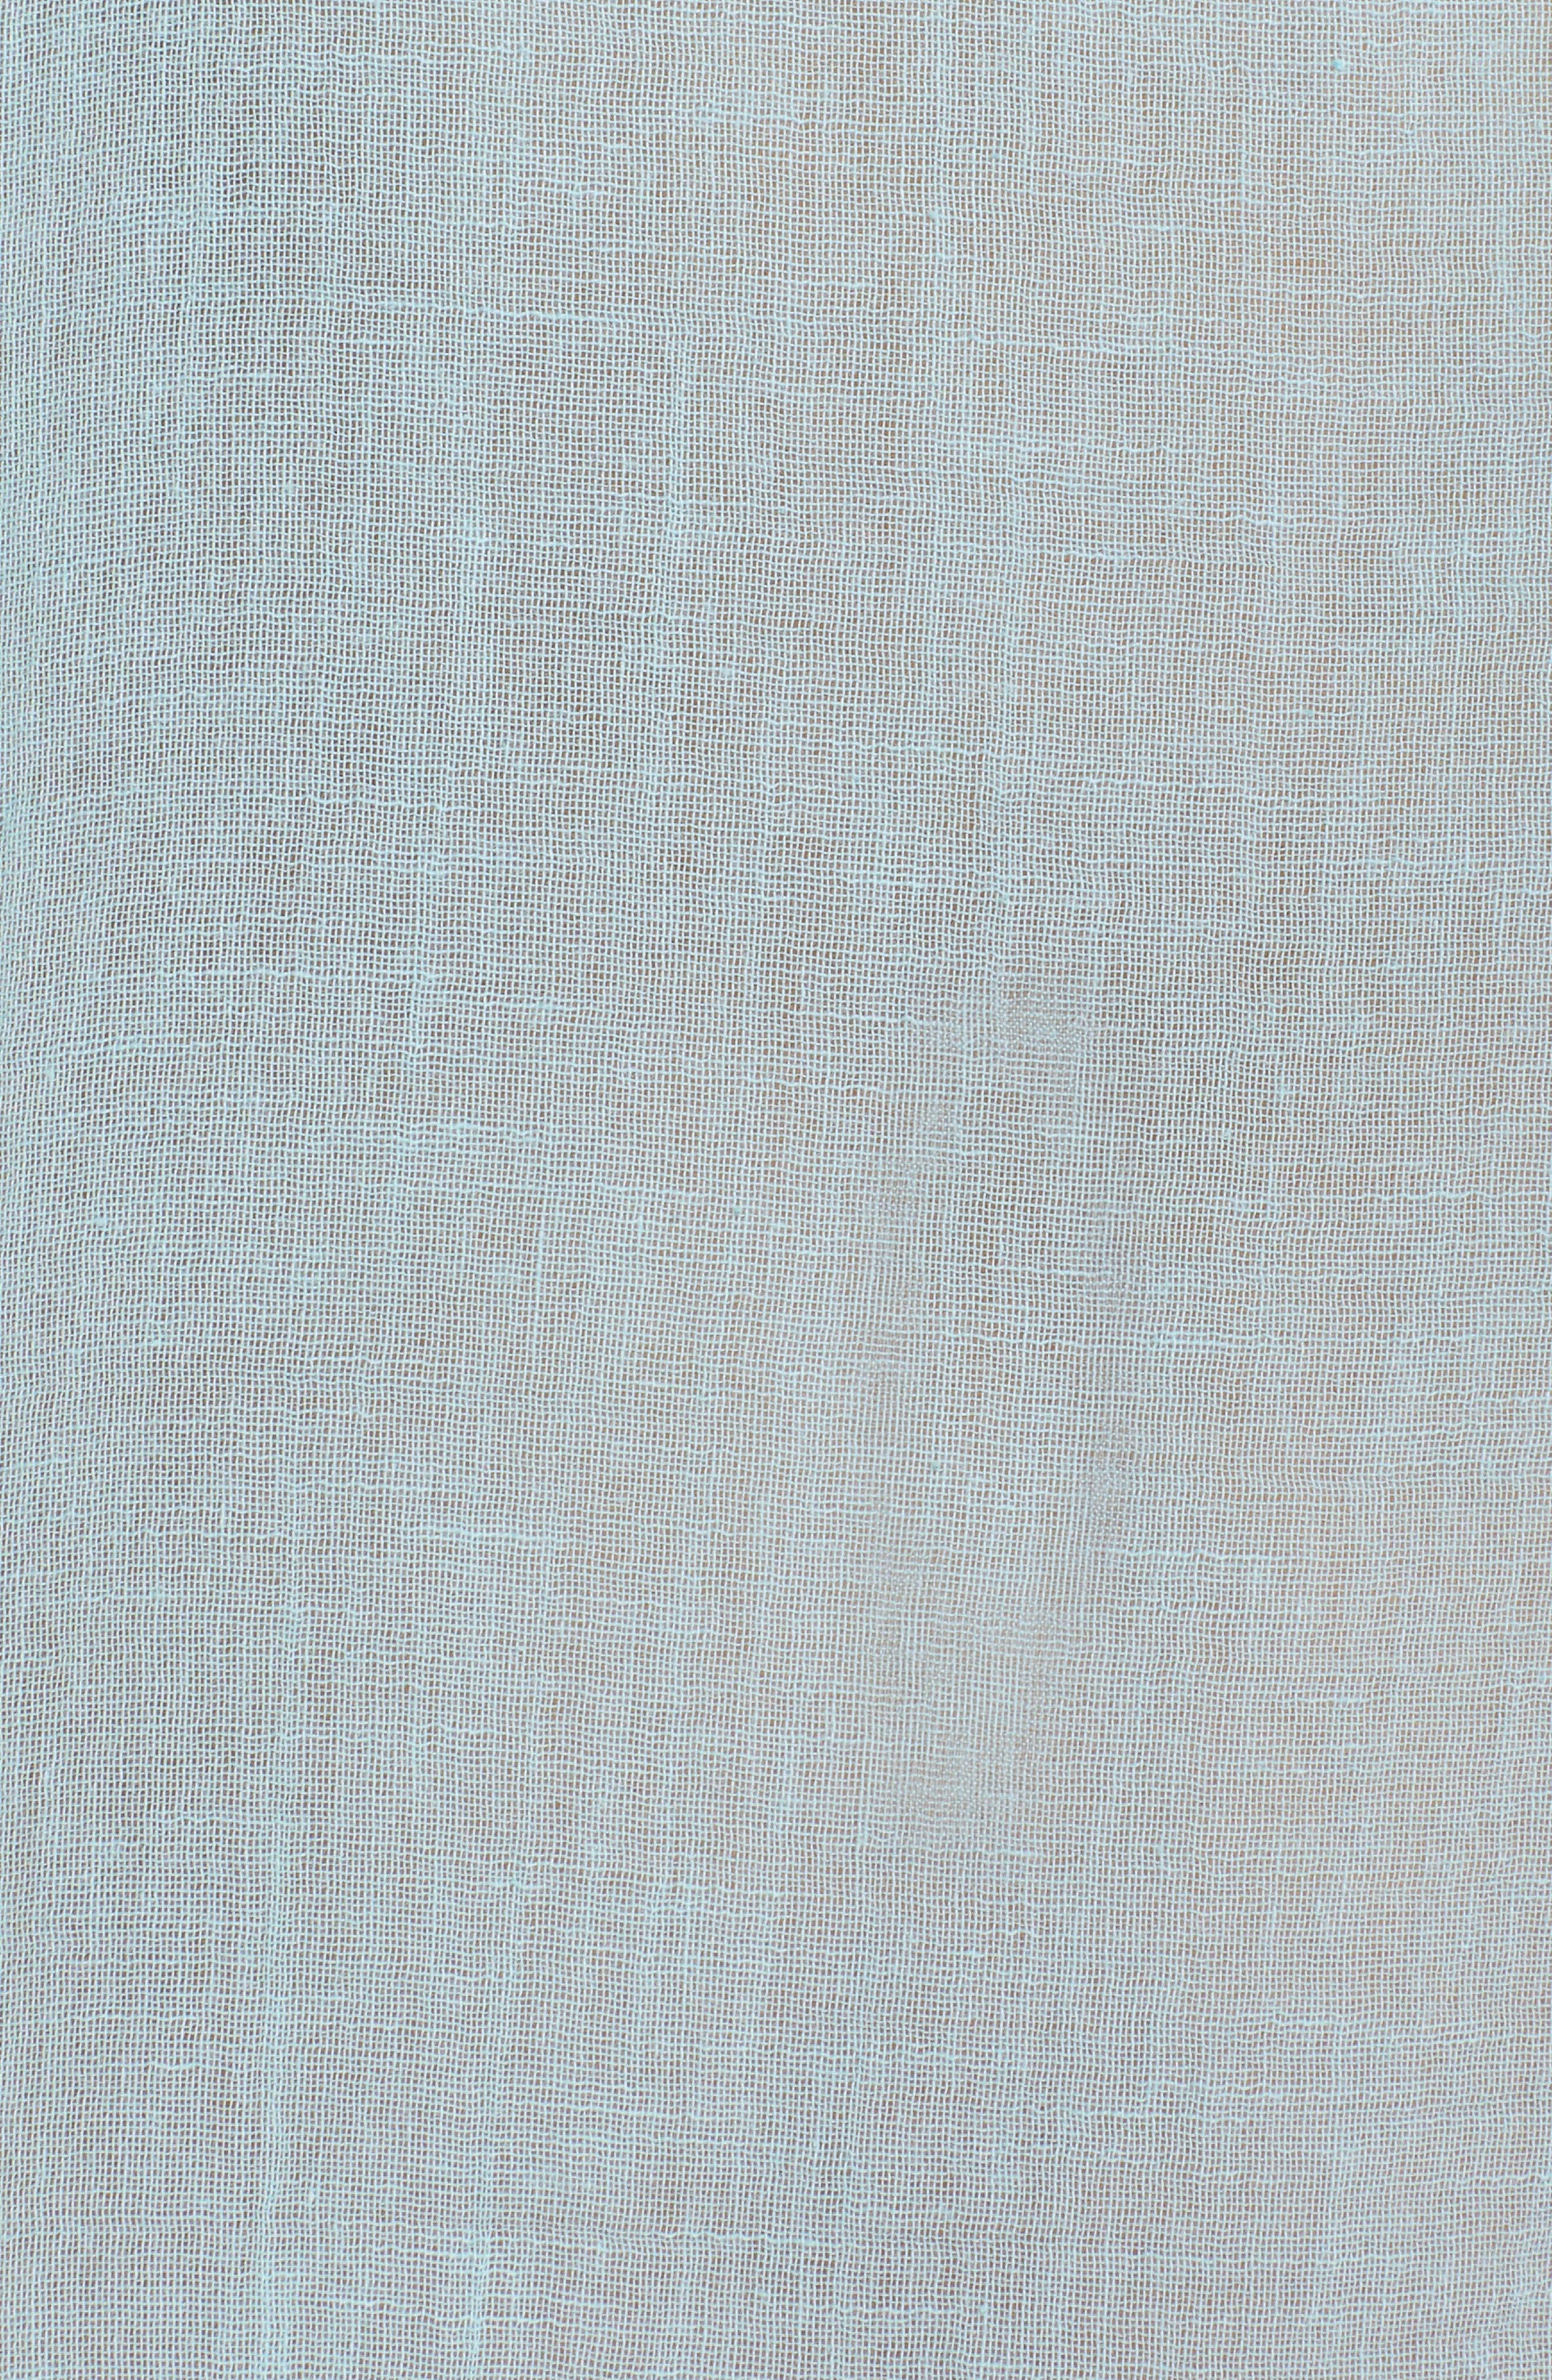 Alternate Image 4  - Seafolly 'Amnesia' Cotton Gauze Cover-Up Caftan